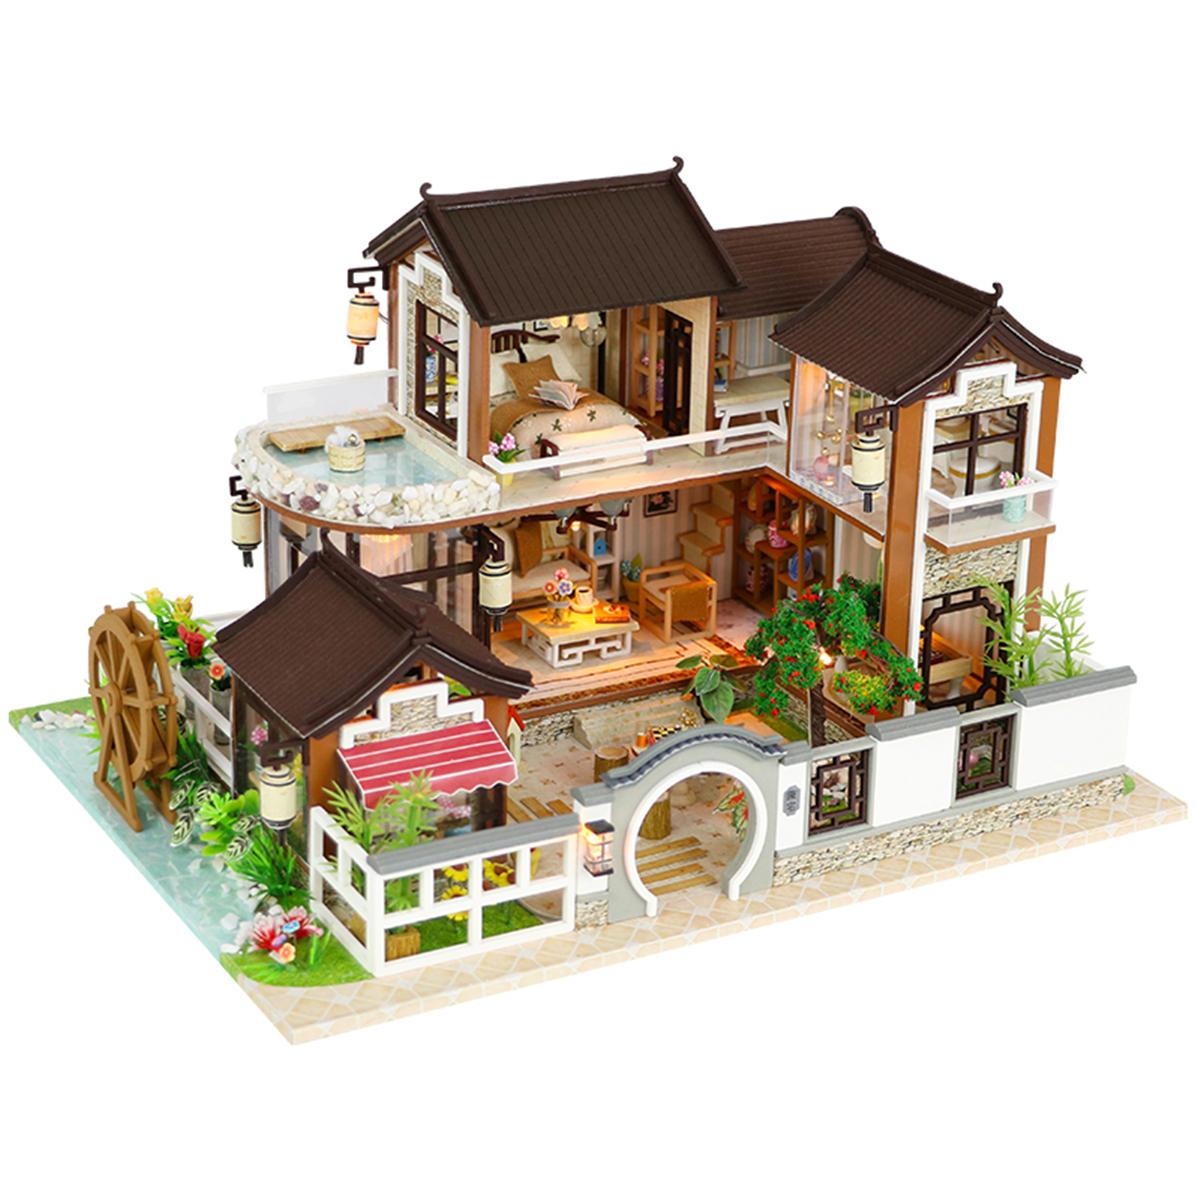 Diy Dollhouse Miniature Doll House Furniture Kit Led Kids Cat Birthday Xmas Gift House